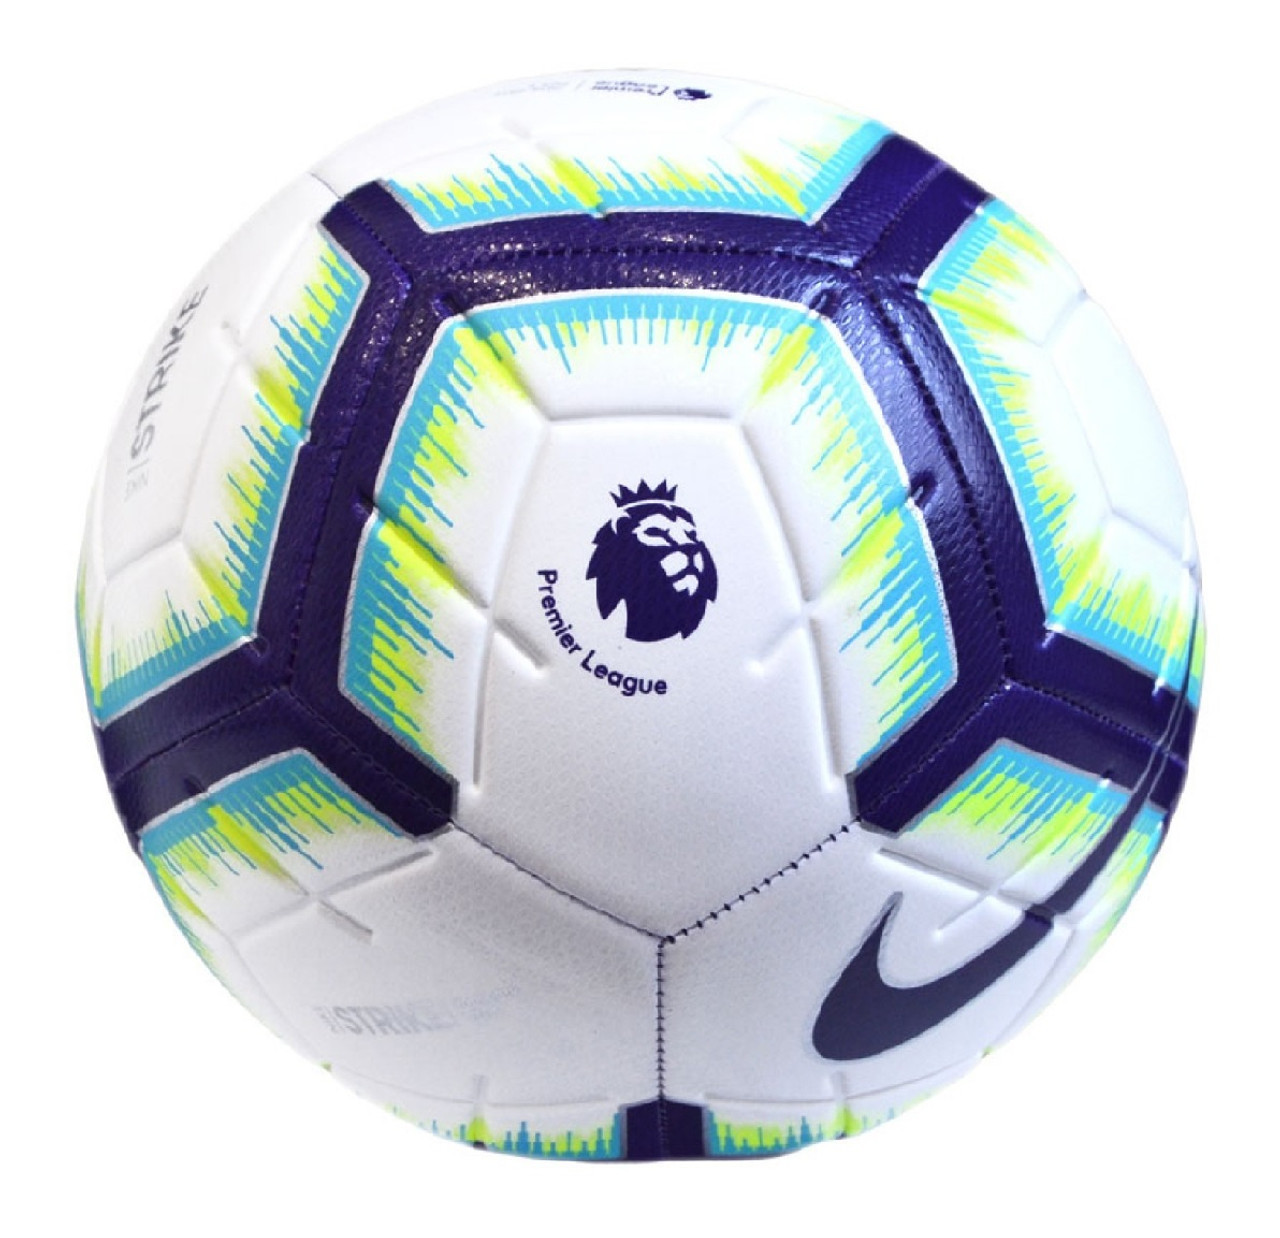 9e79420a2418 Nike Strike Premier League Ball - White/Blue/Purple (10719) - ohp soccer